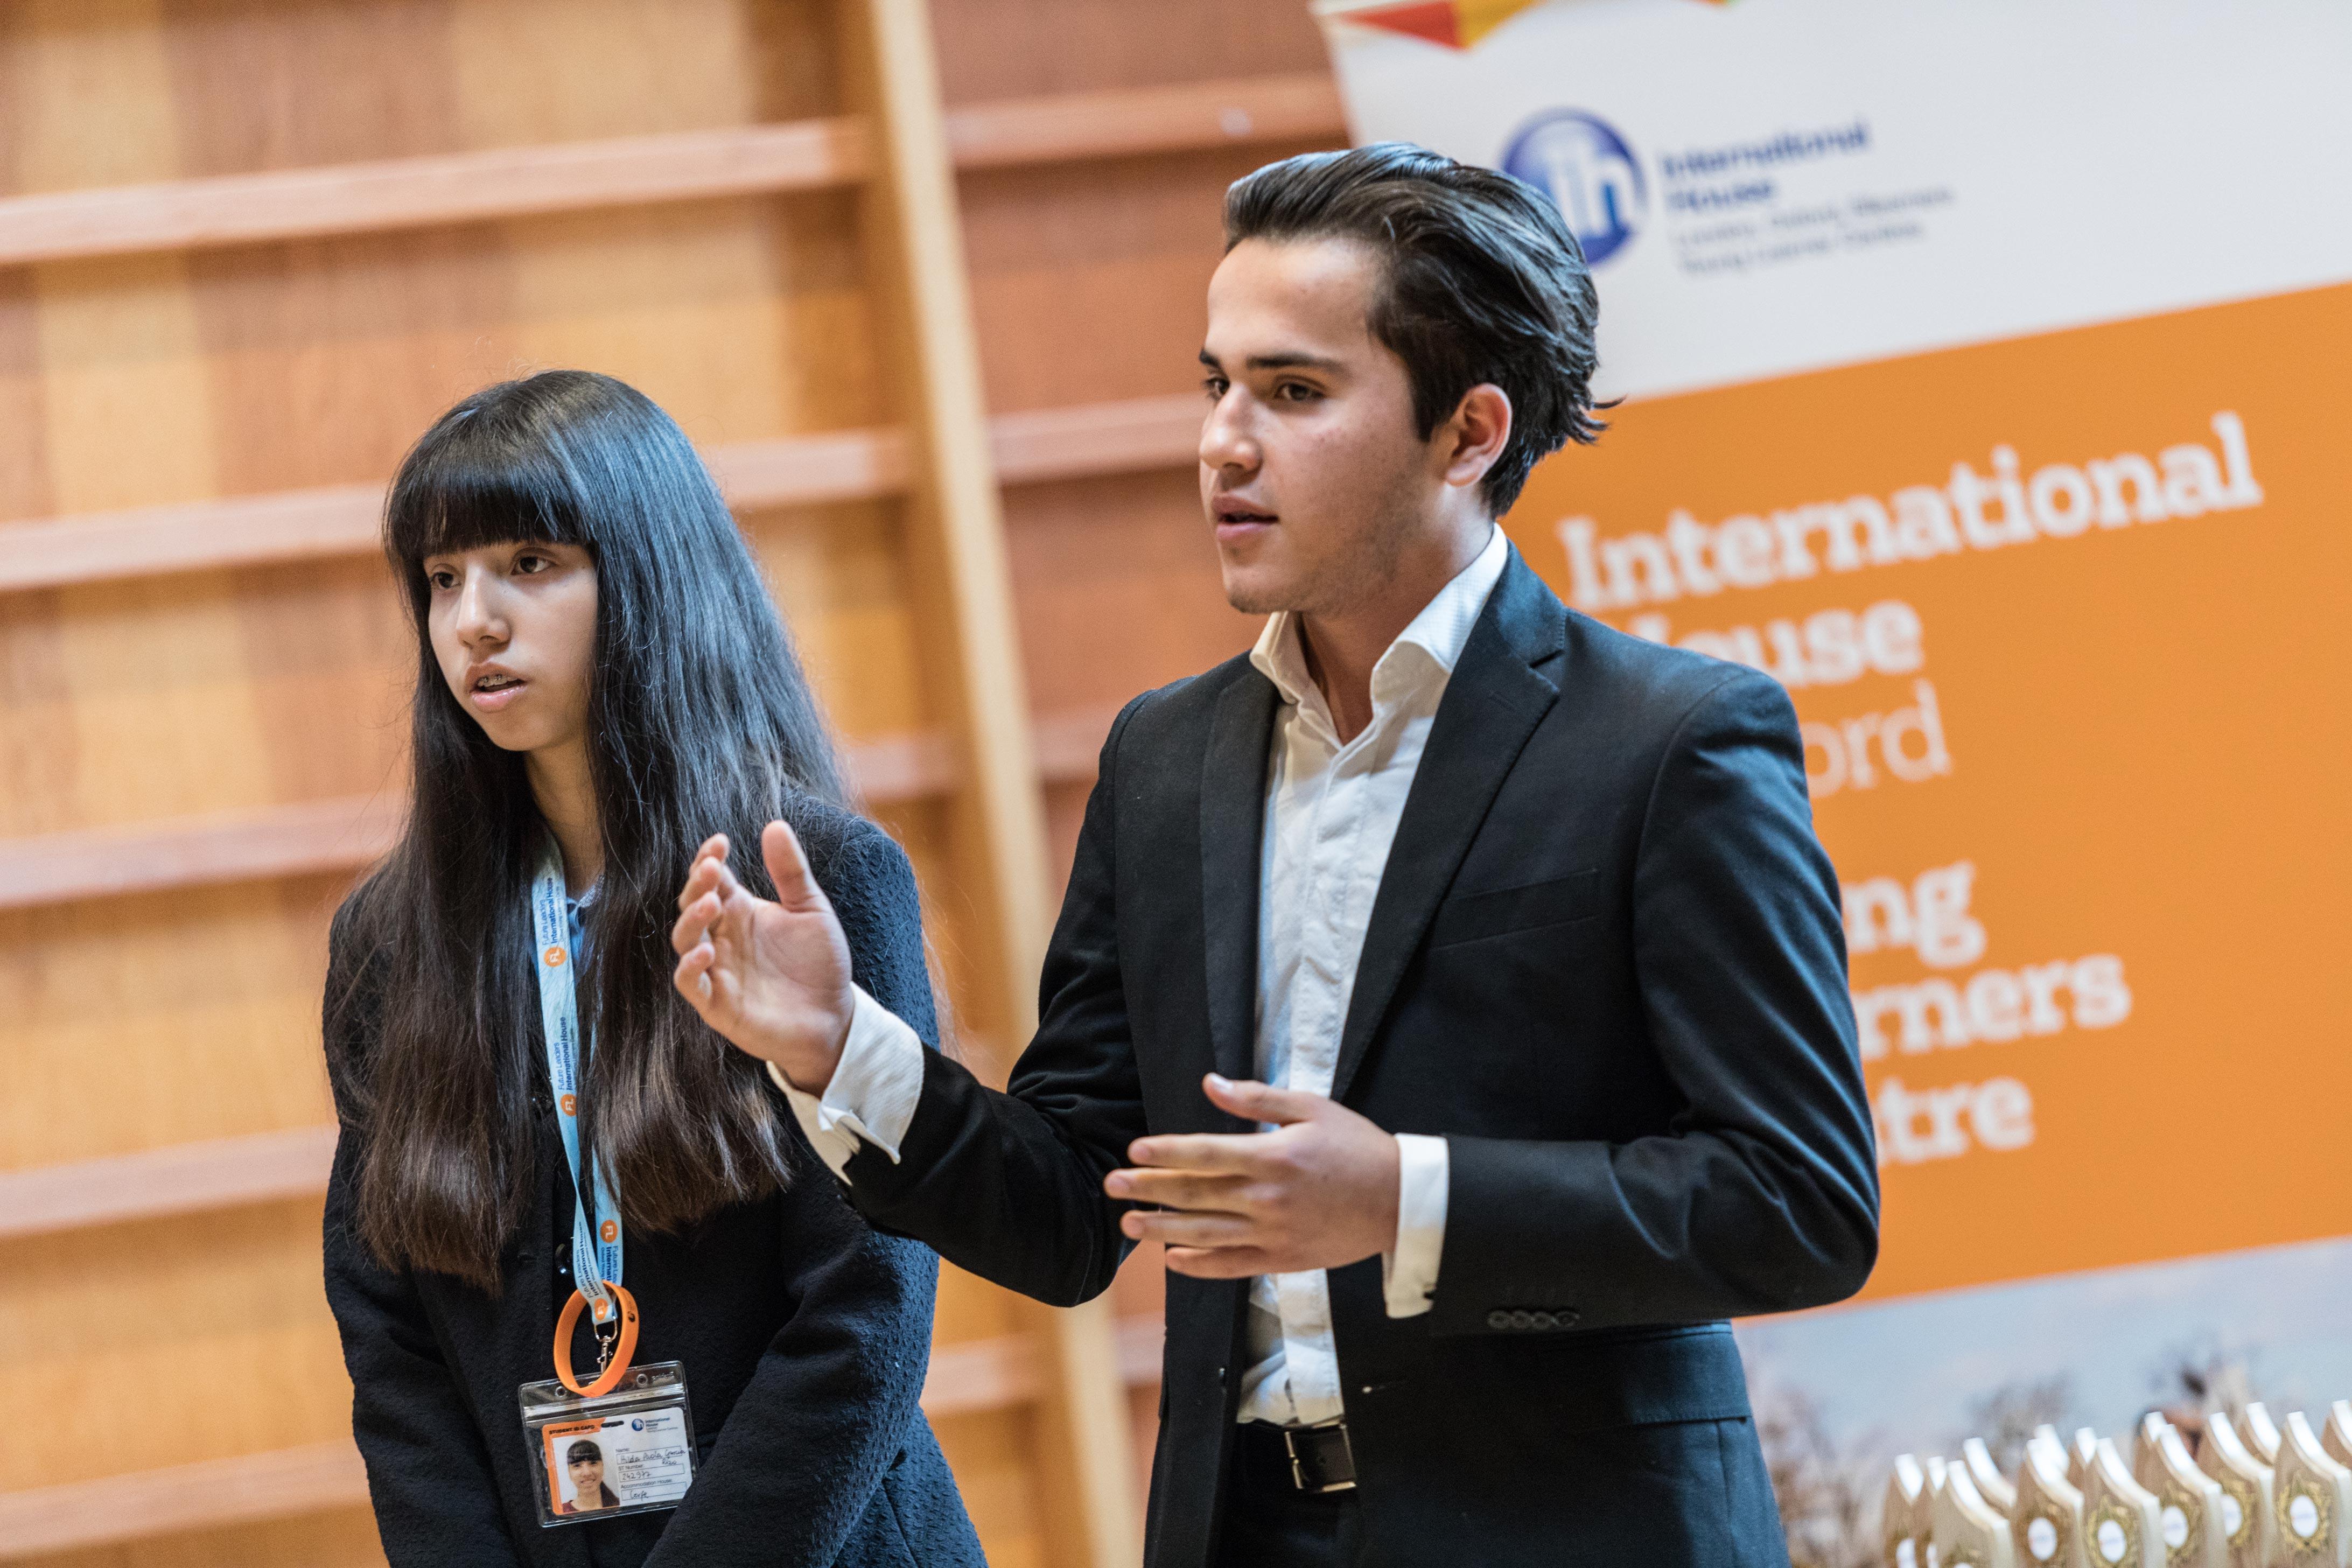 World Leaders Future Leaders UN Sustainable Development Goals